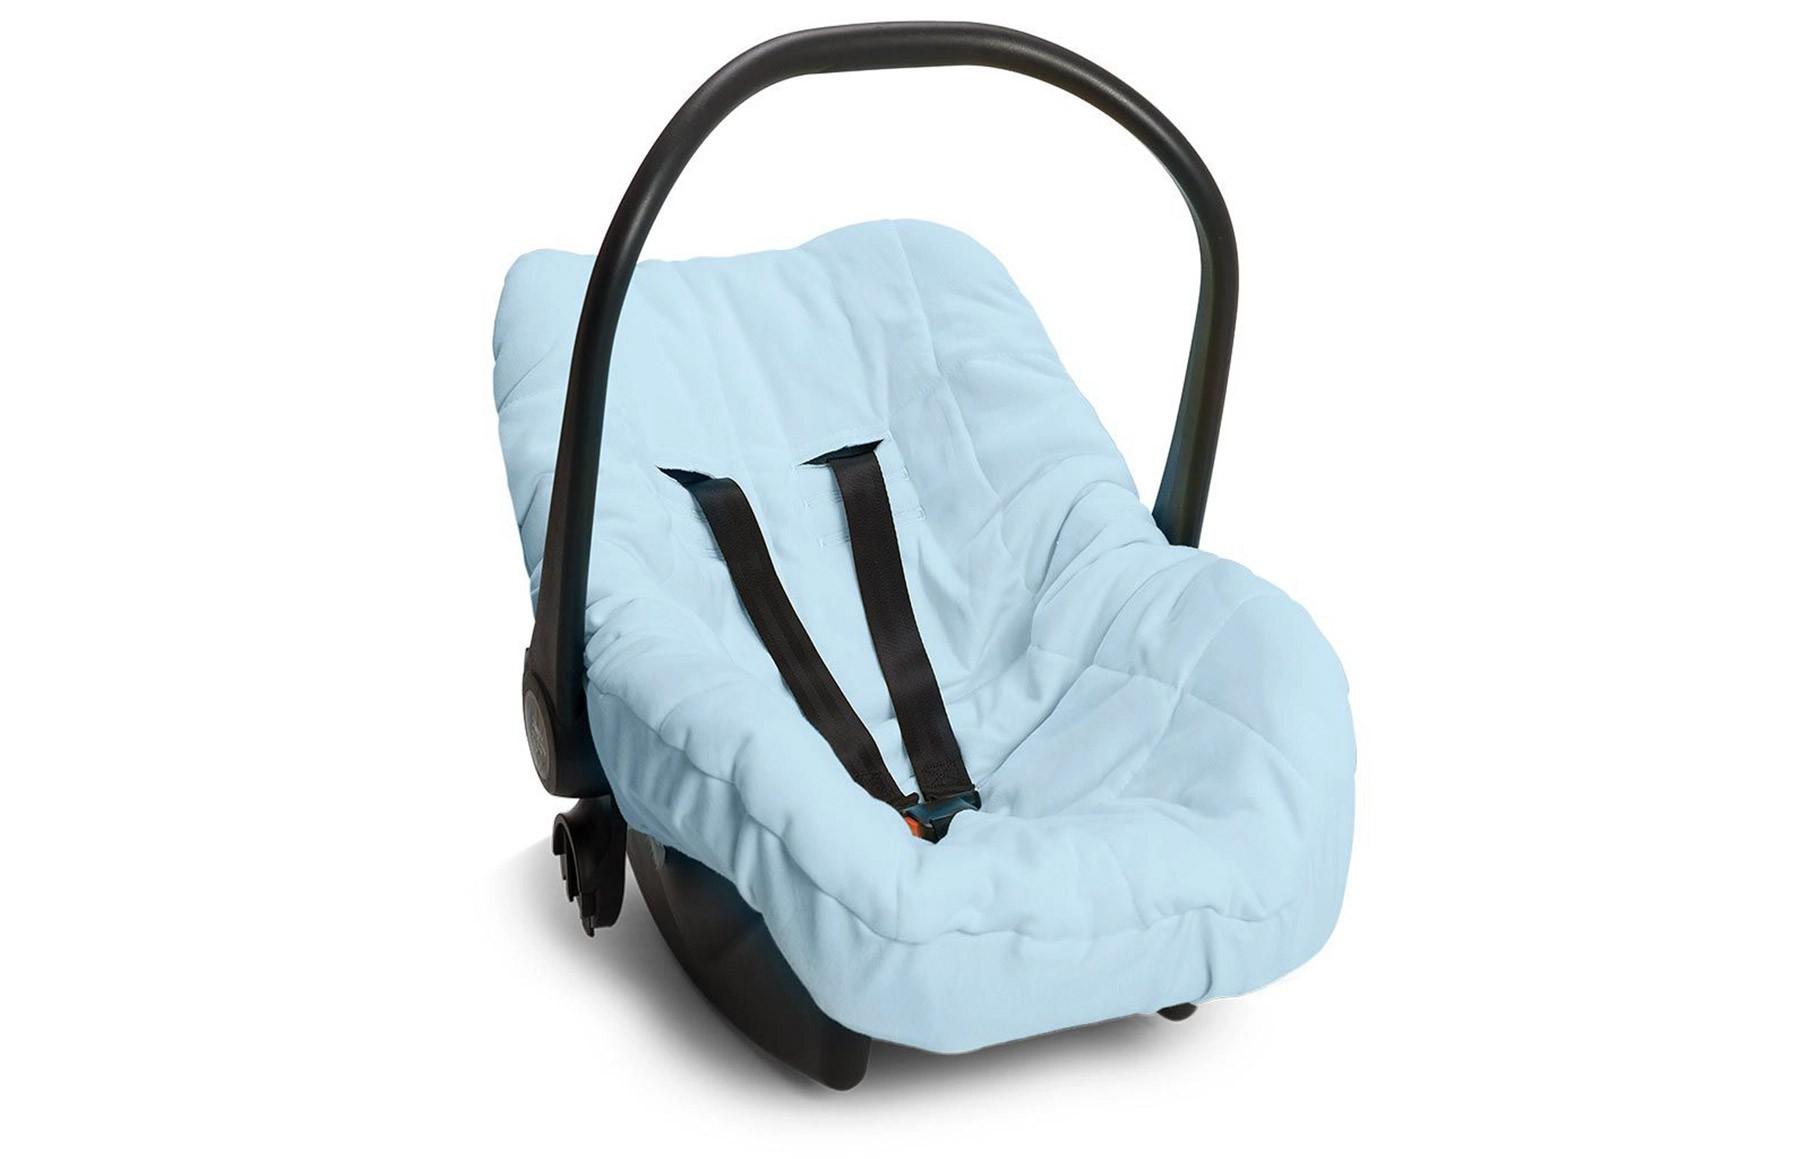 Capa Bebê Conforto Acessórios Azul